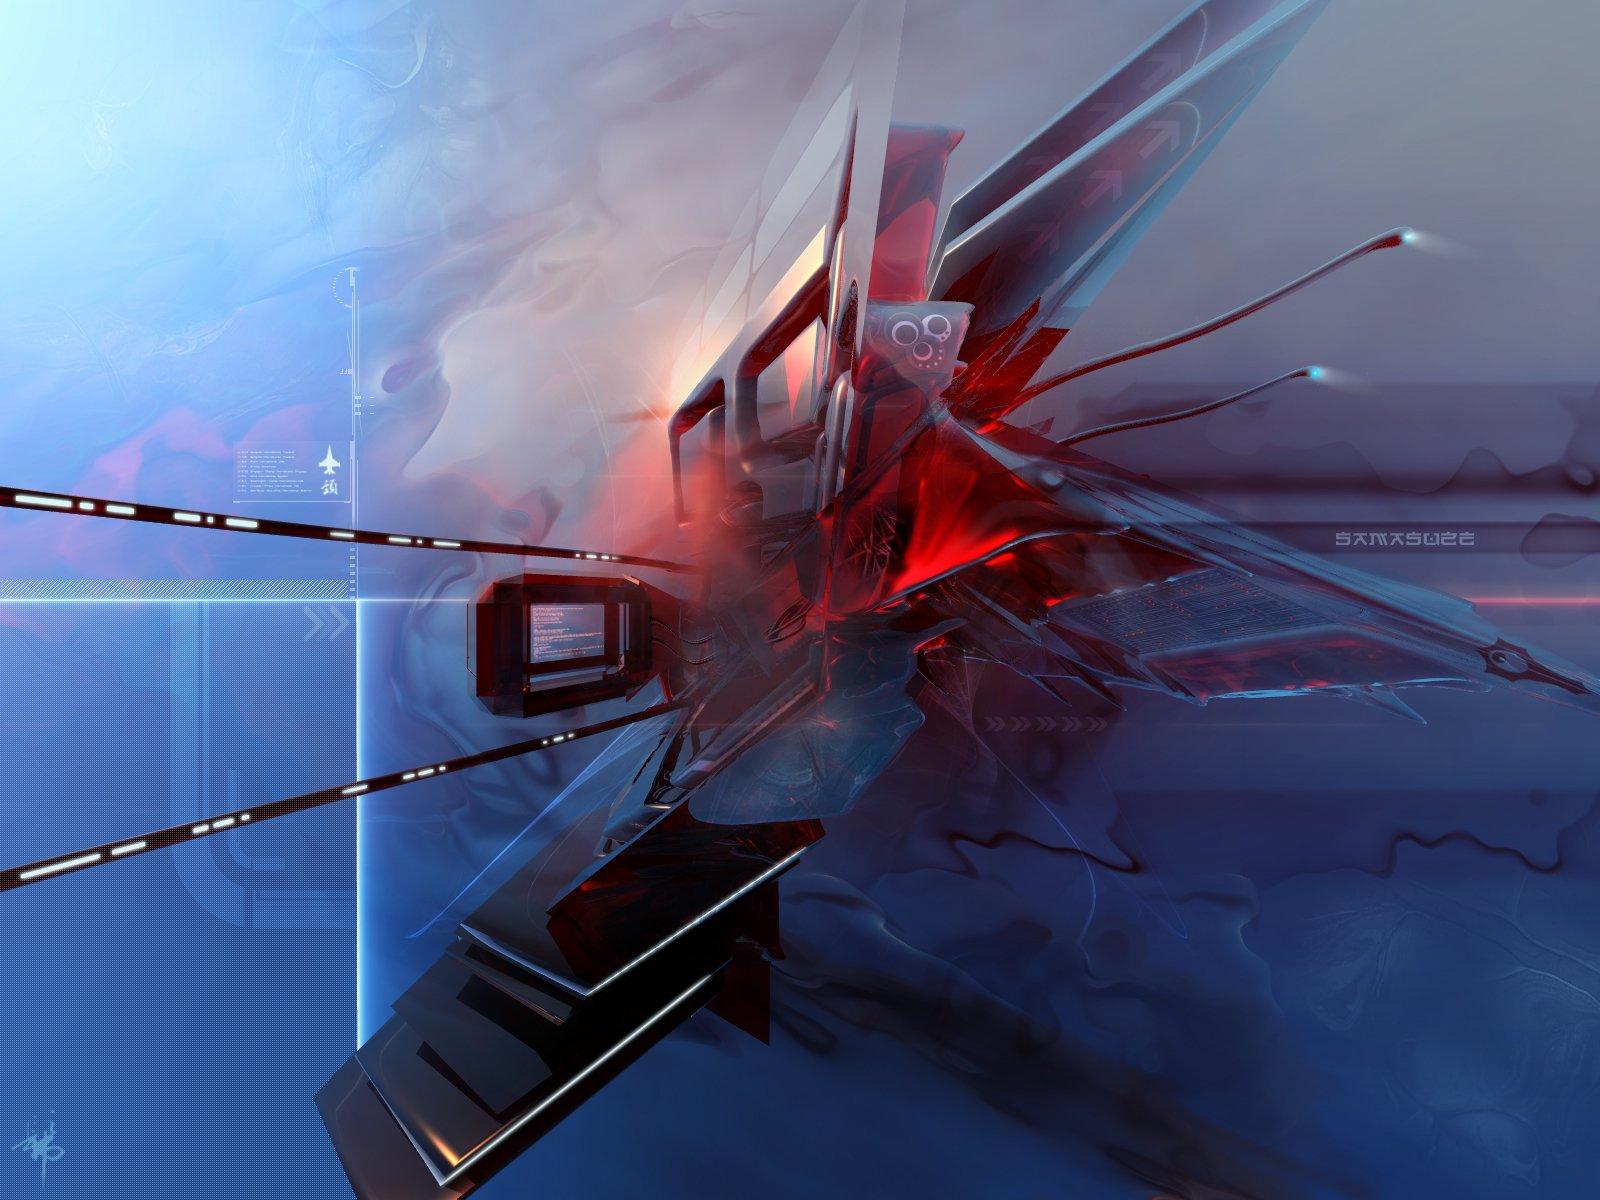 Abstract - Blue  Colors Artistic Abstract 3D CGI Digital Wallpaper